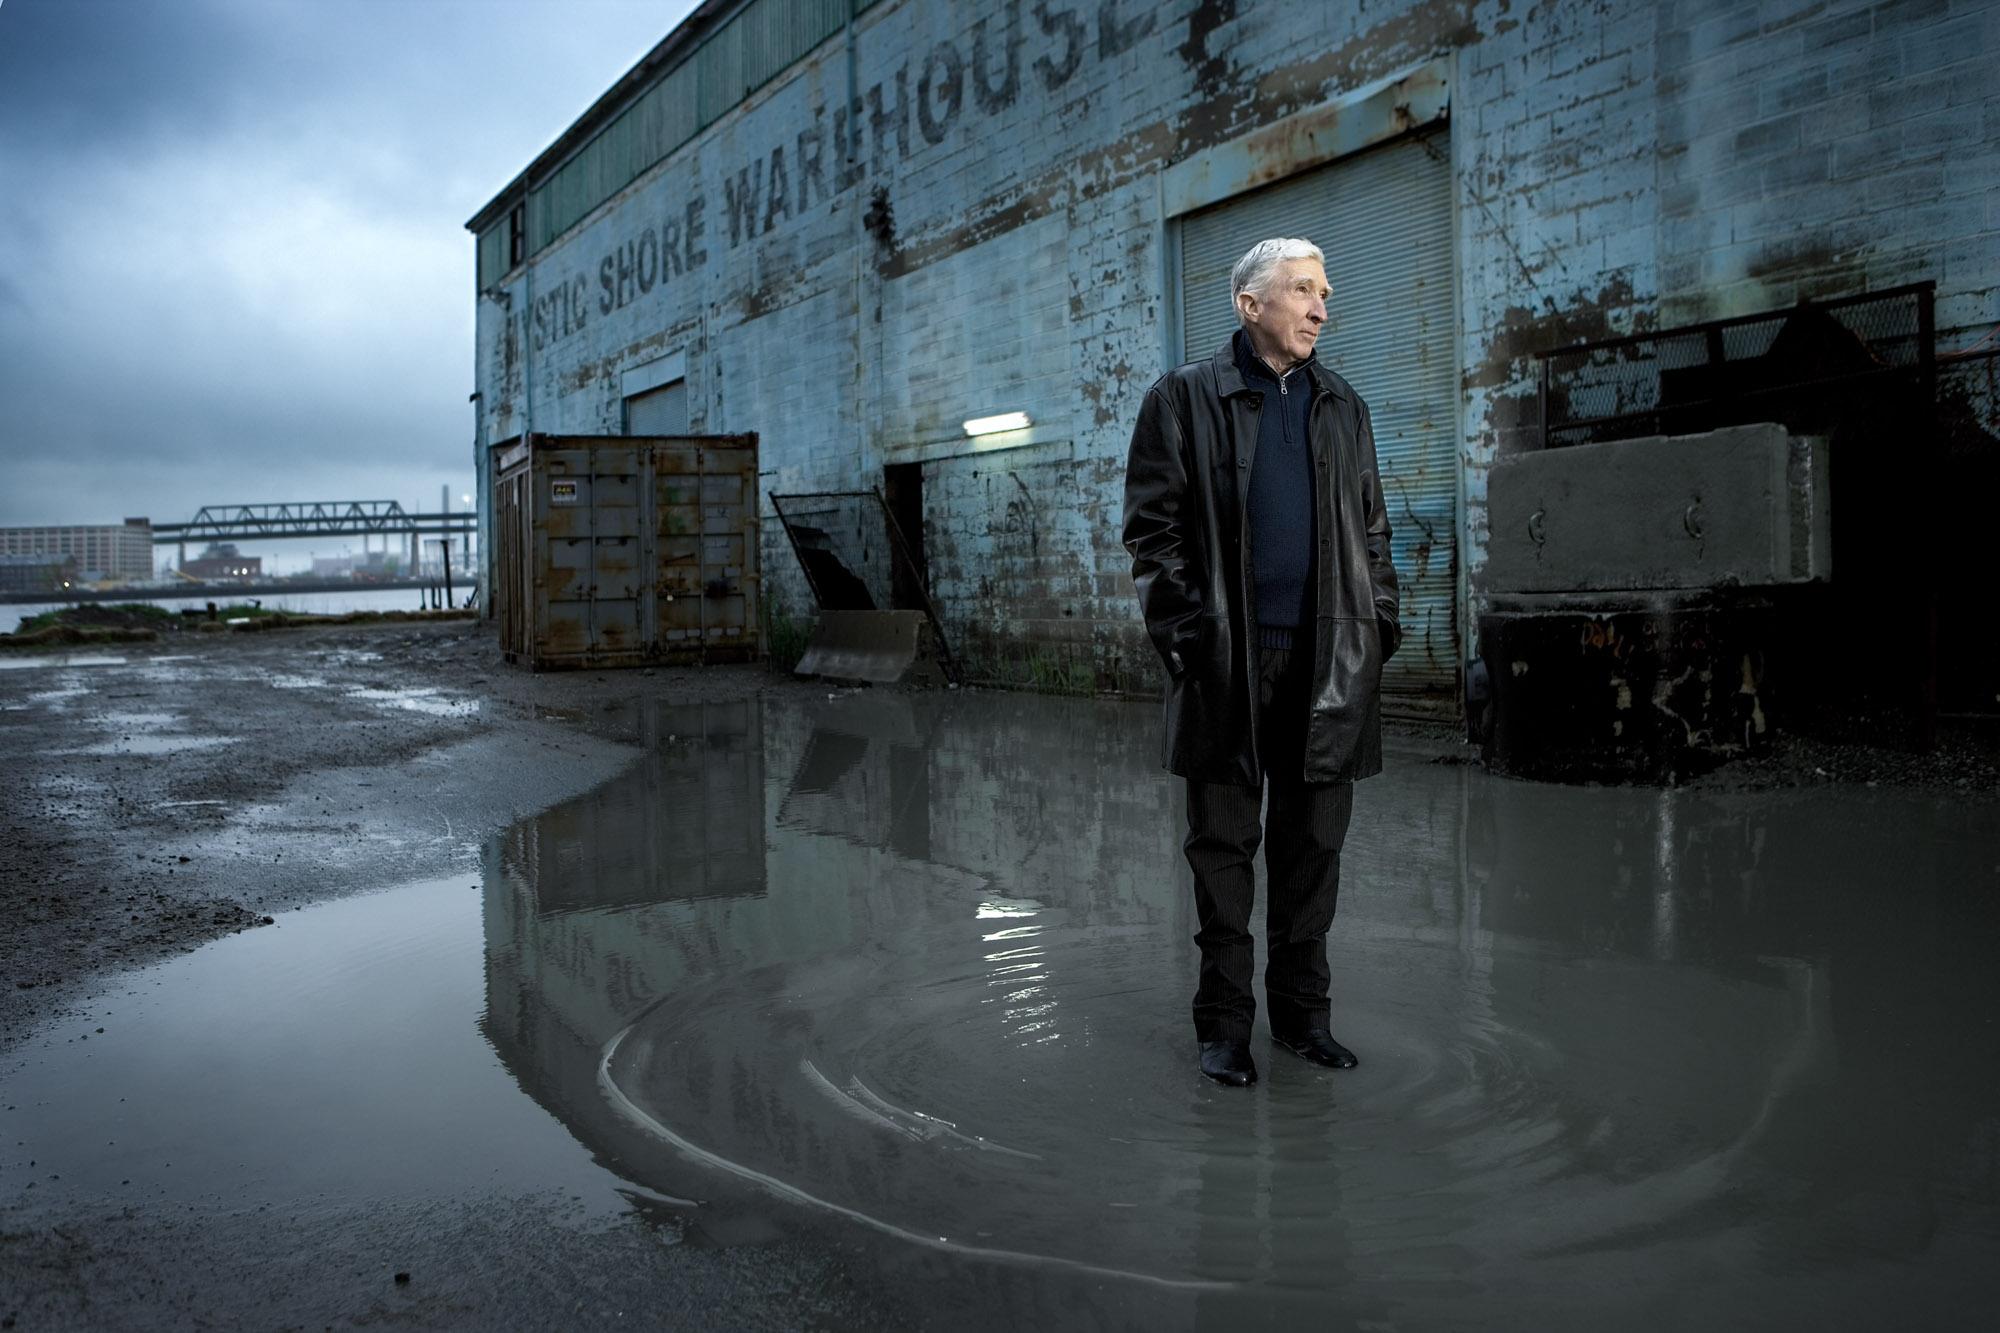 henrik-knudsen-editorial-portraits-10.jpg